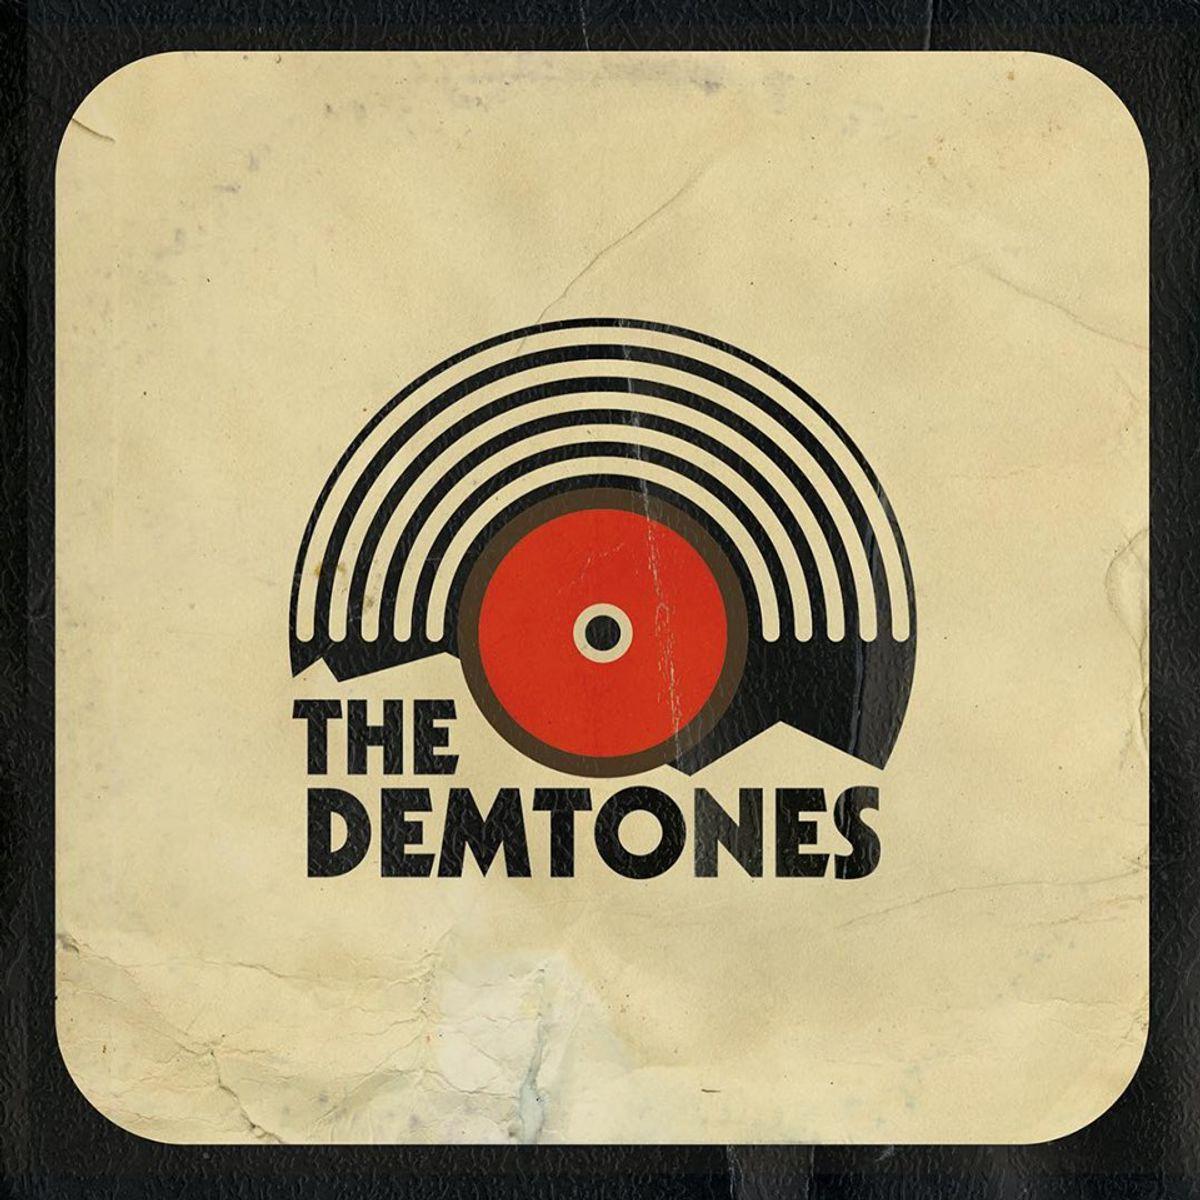 The Demtones